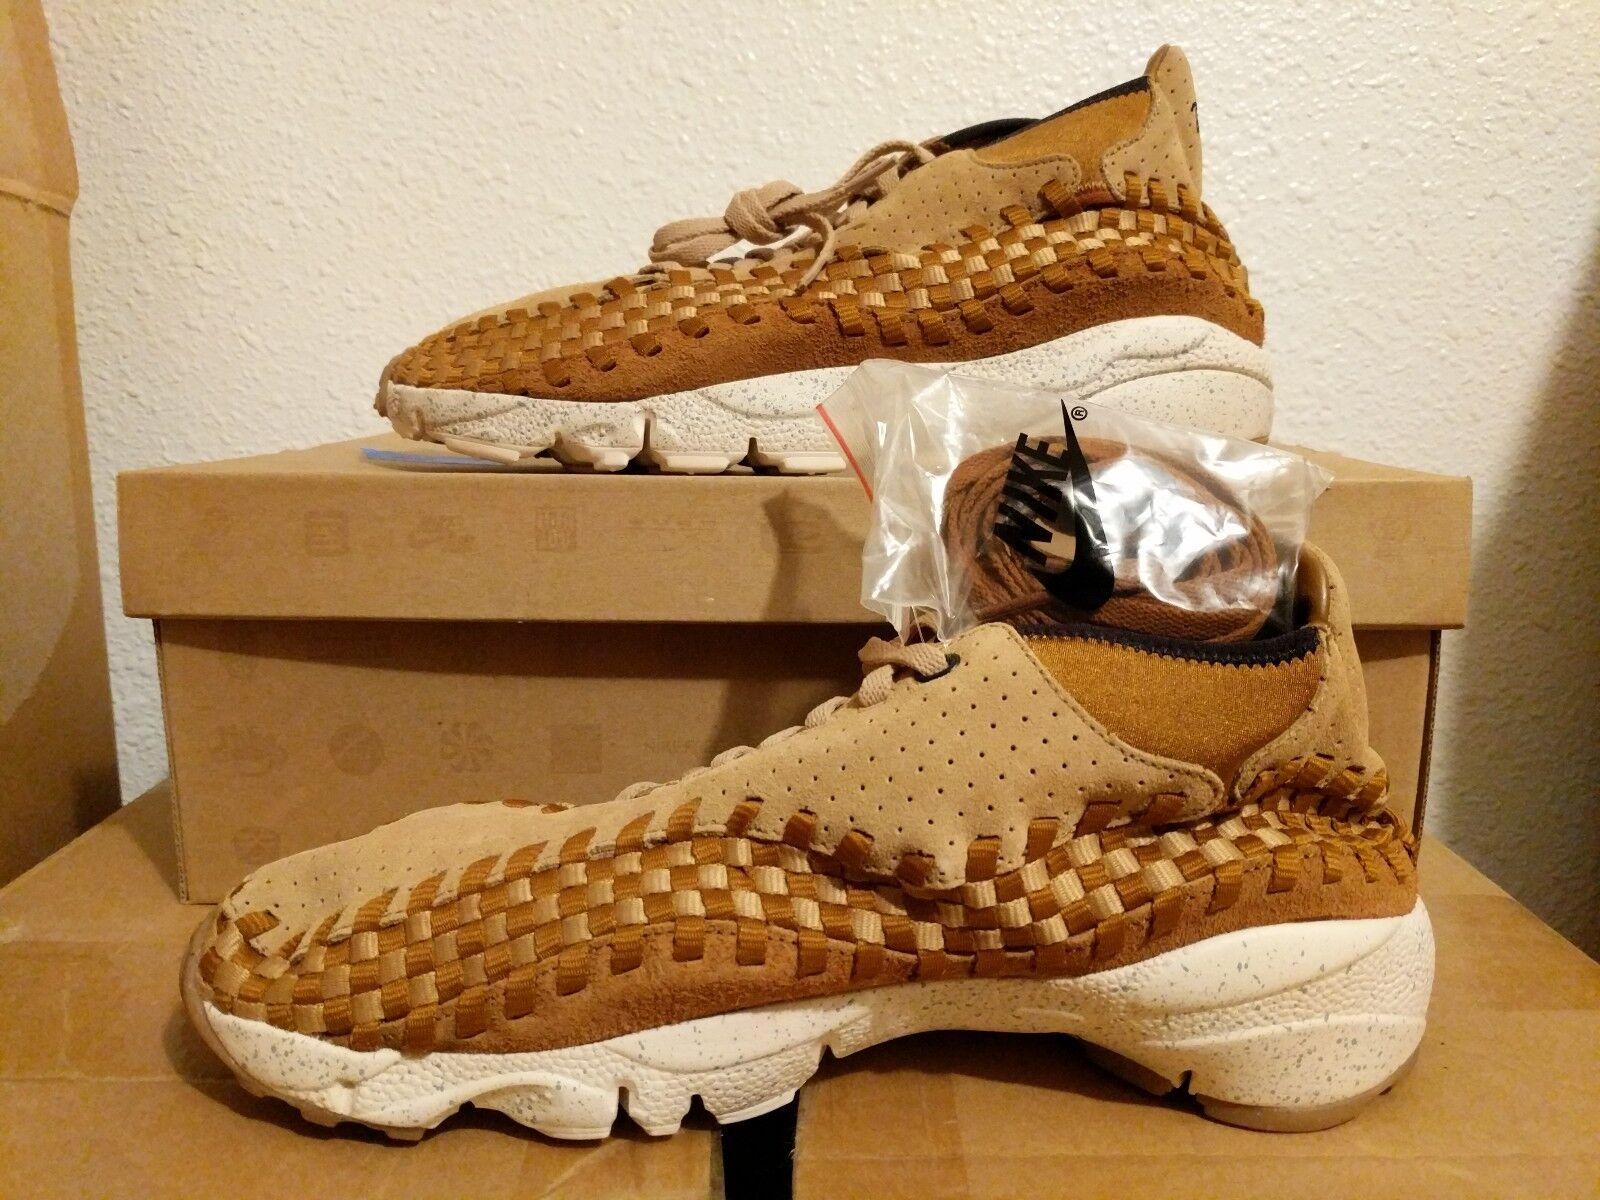 Nike Bodega Air Footscape Woven Chukka PRM sz 10.5  446337 202